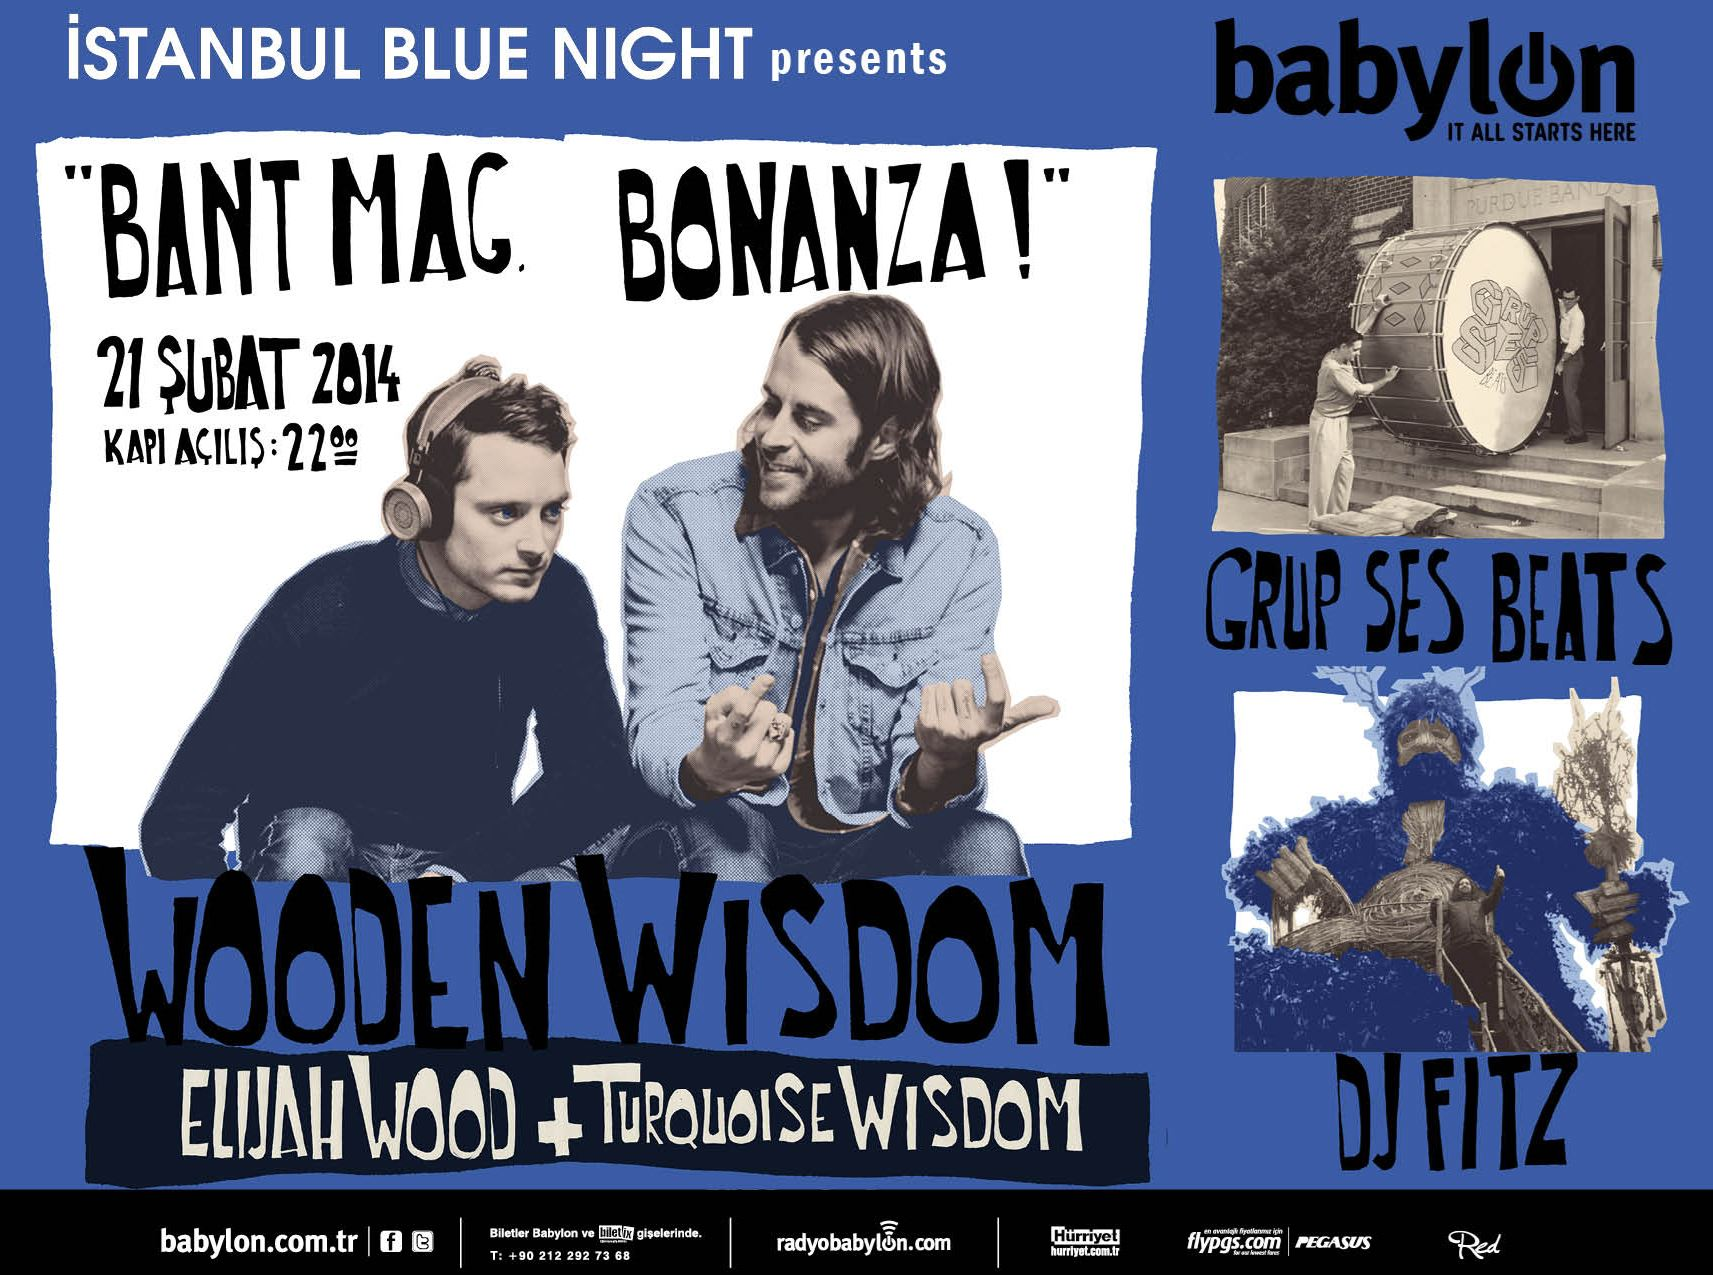 İstanbul Blue Night Presents: BANT MAG. BONANZA